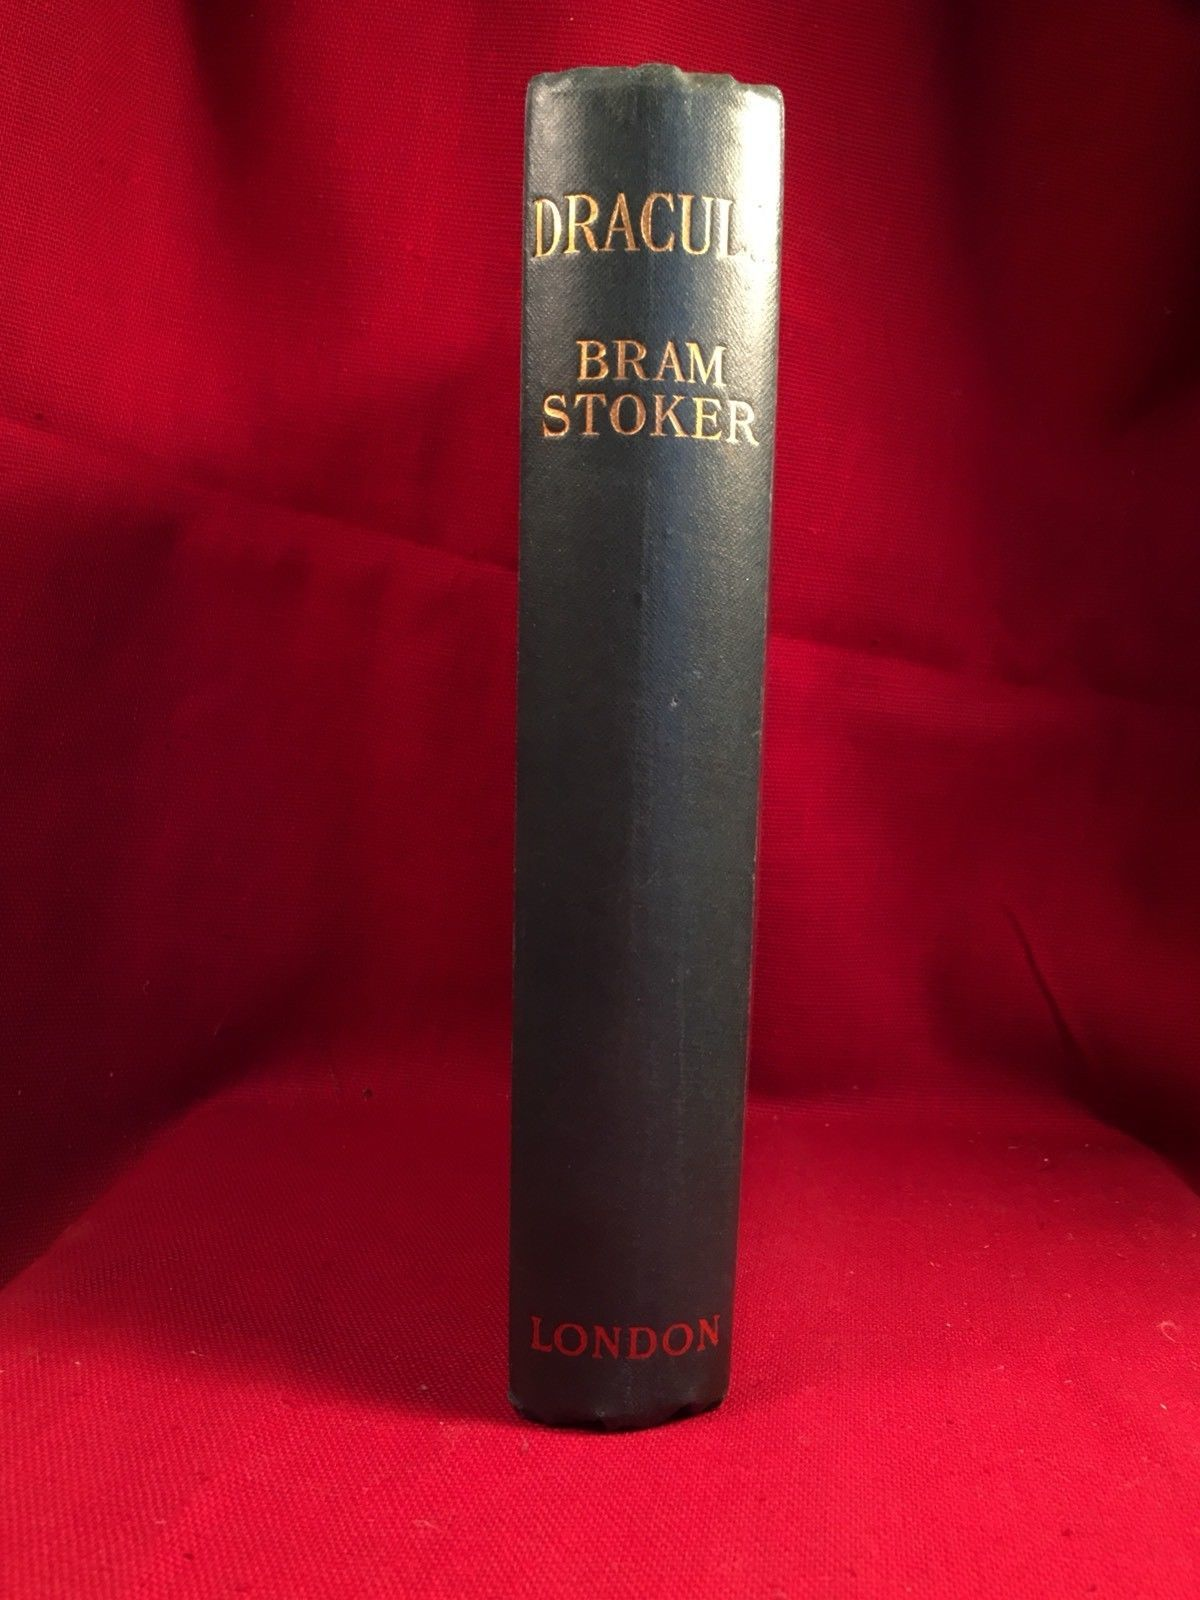 DRACULA Bram Stoker Constable edition - Bram Stoker signature.